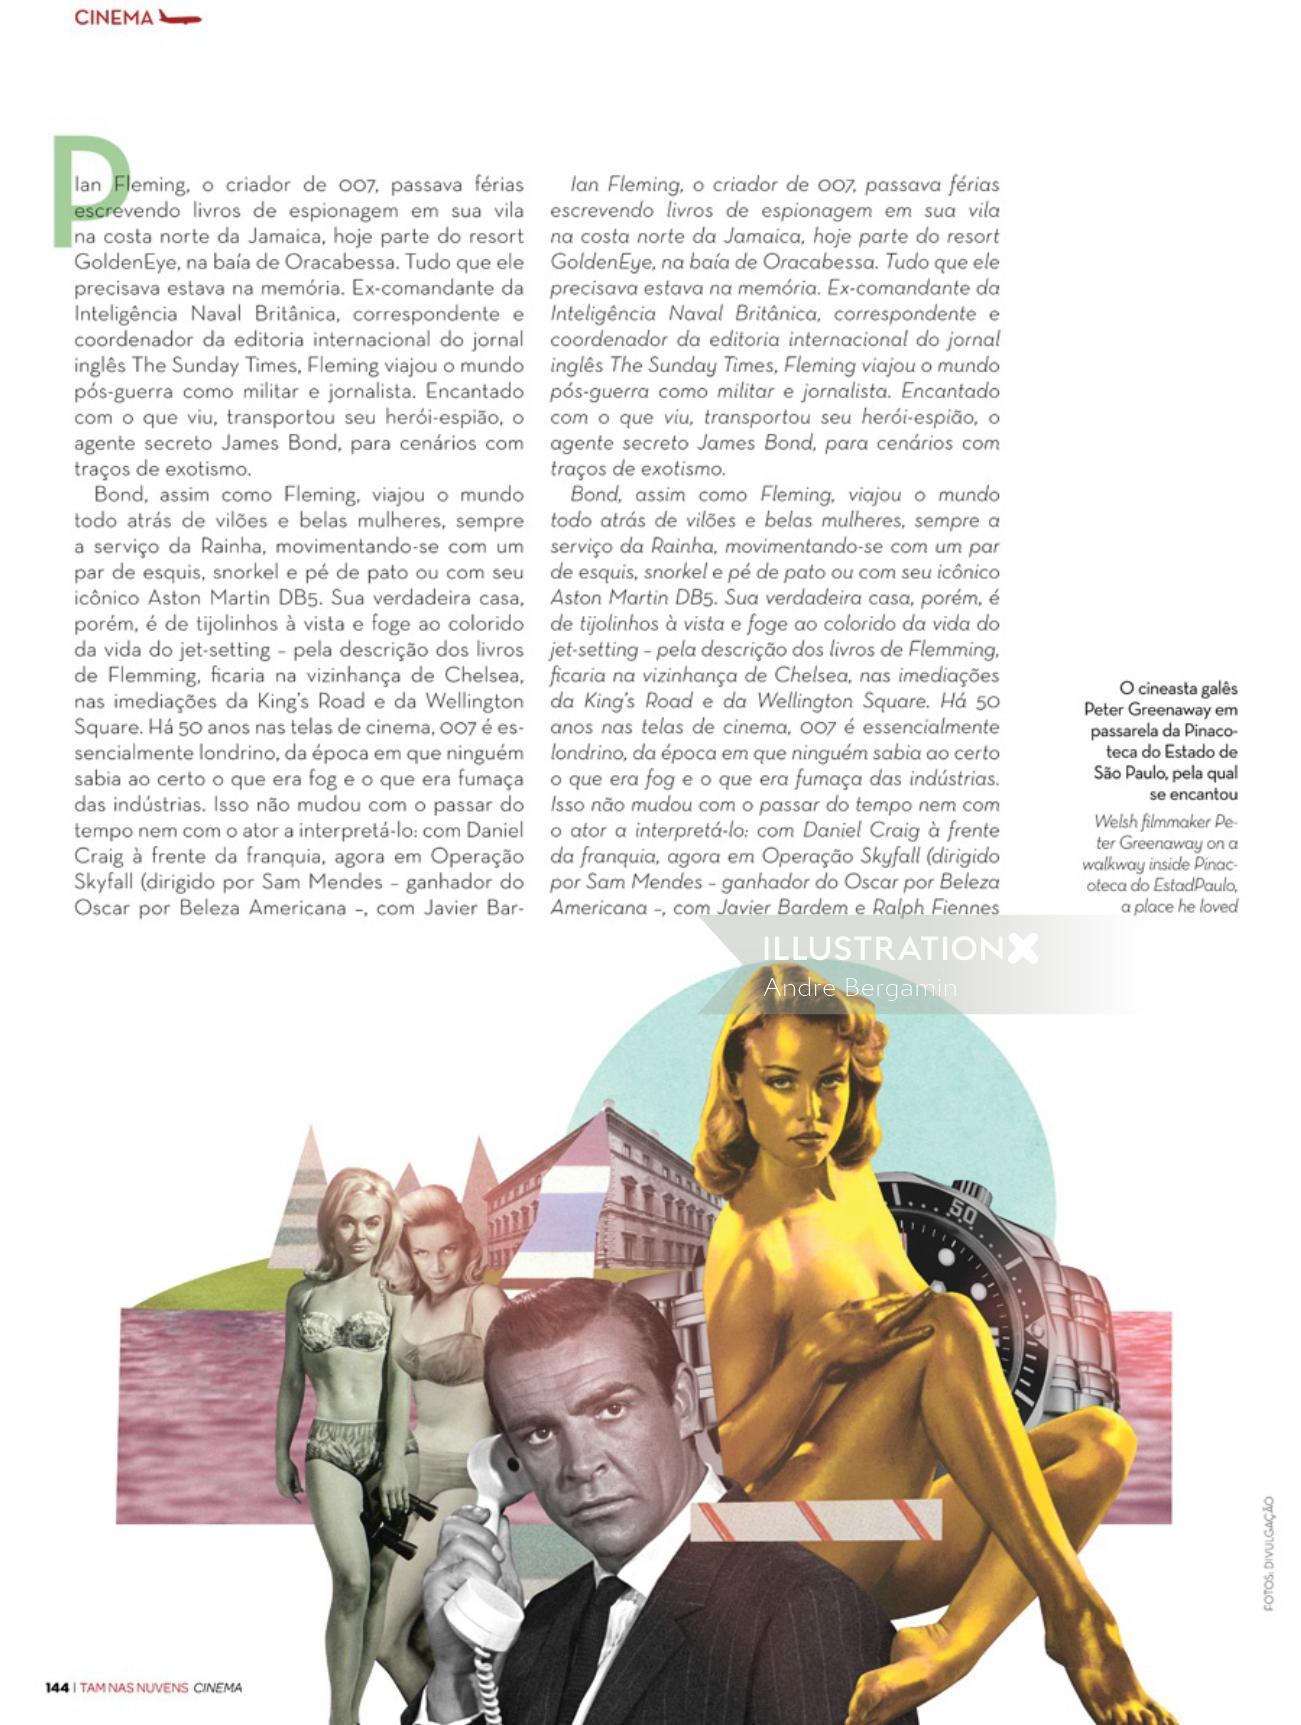 Editorial art for James Bond franchise